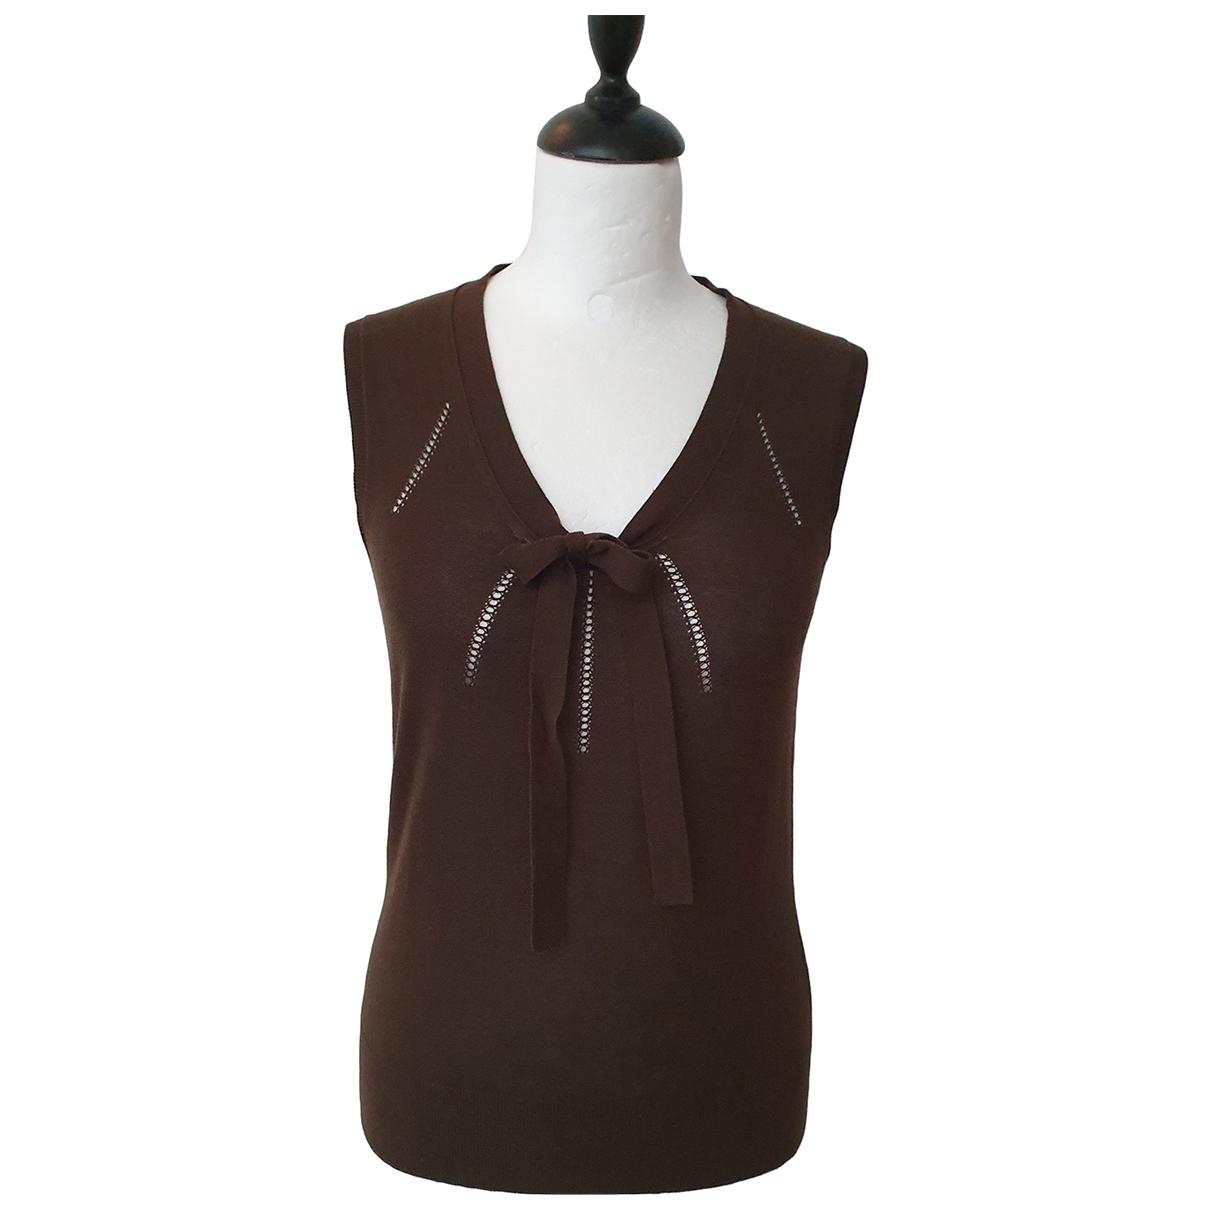 Celine \N Brown Cotton  top for Women S International